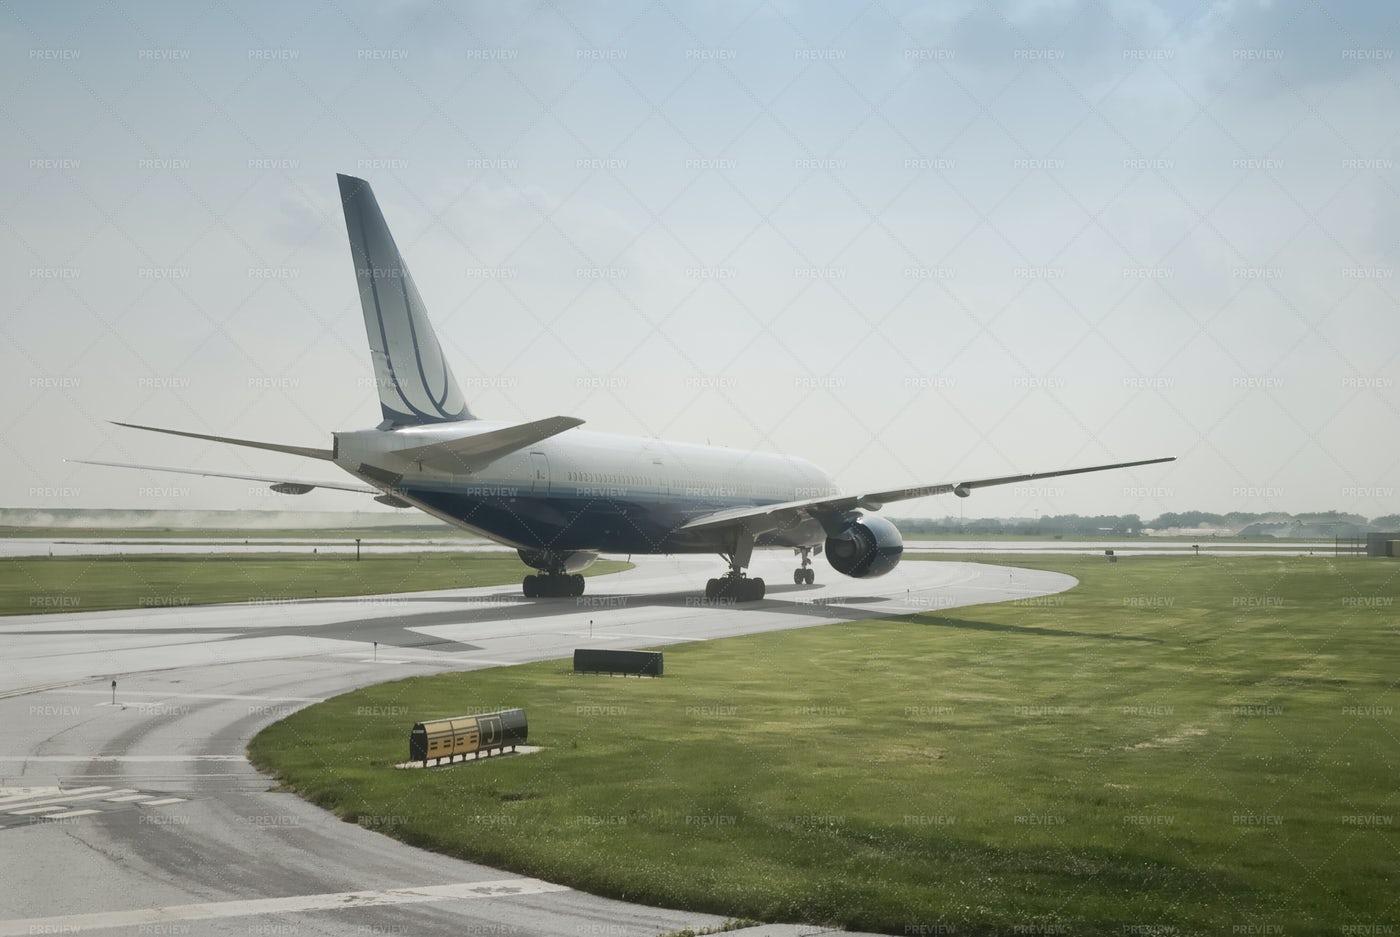 Double Engine Passenger Jet: Stock Photos